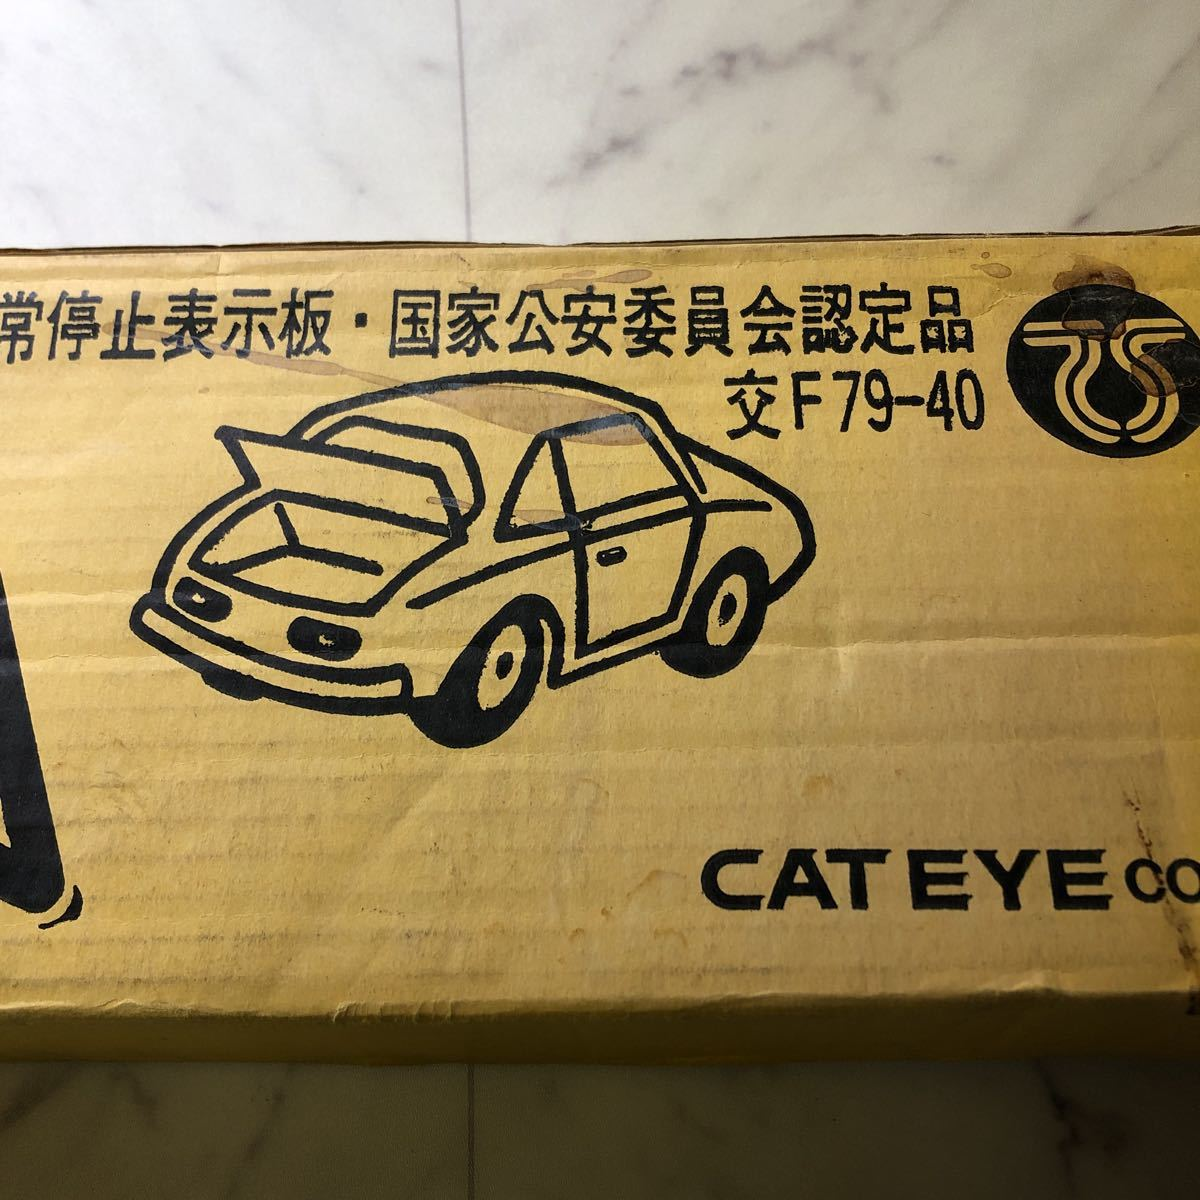 CAT EYE製デルタサイン三角表示板★RR-1800-A★キャットアイΔサイン★反射板/非常三角停止表示板_画像3